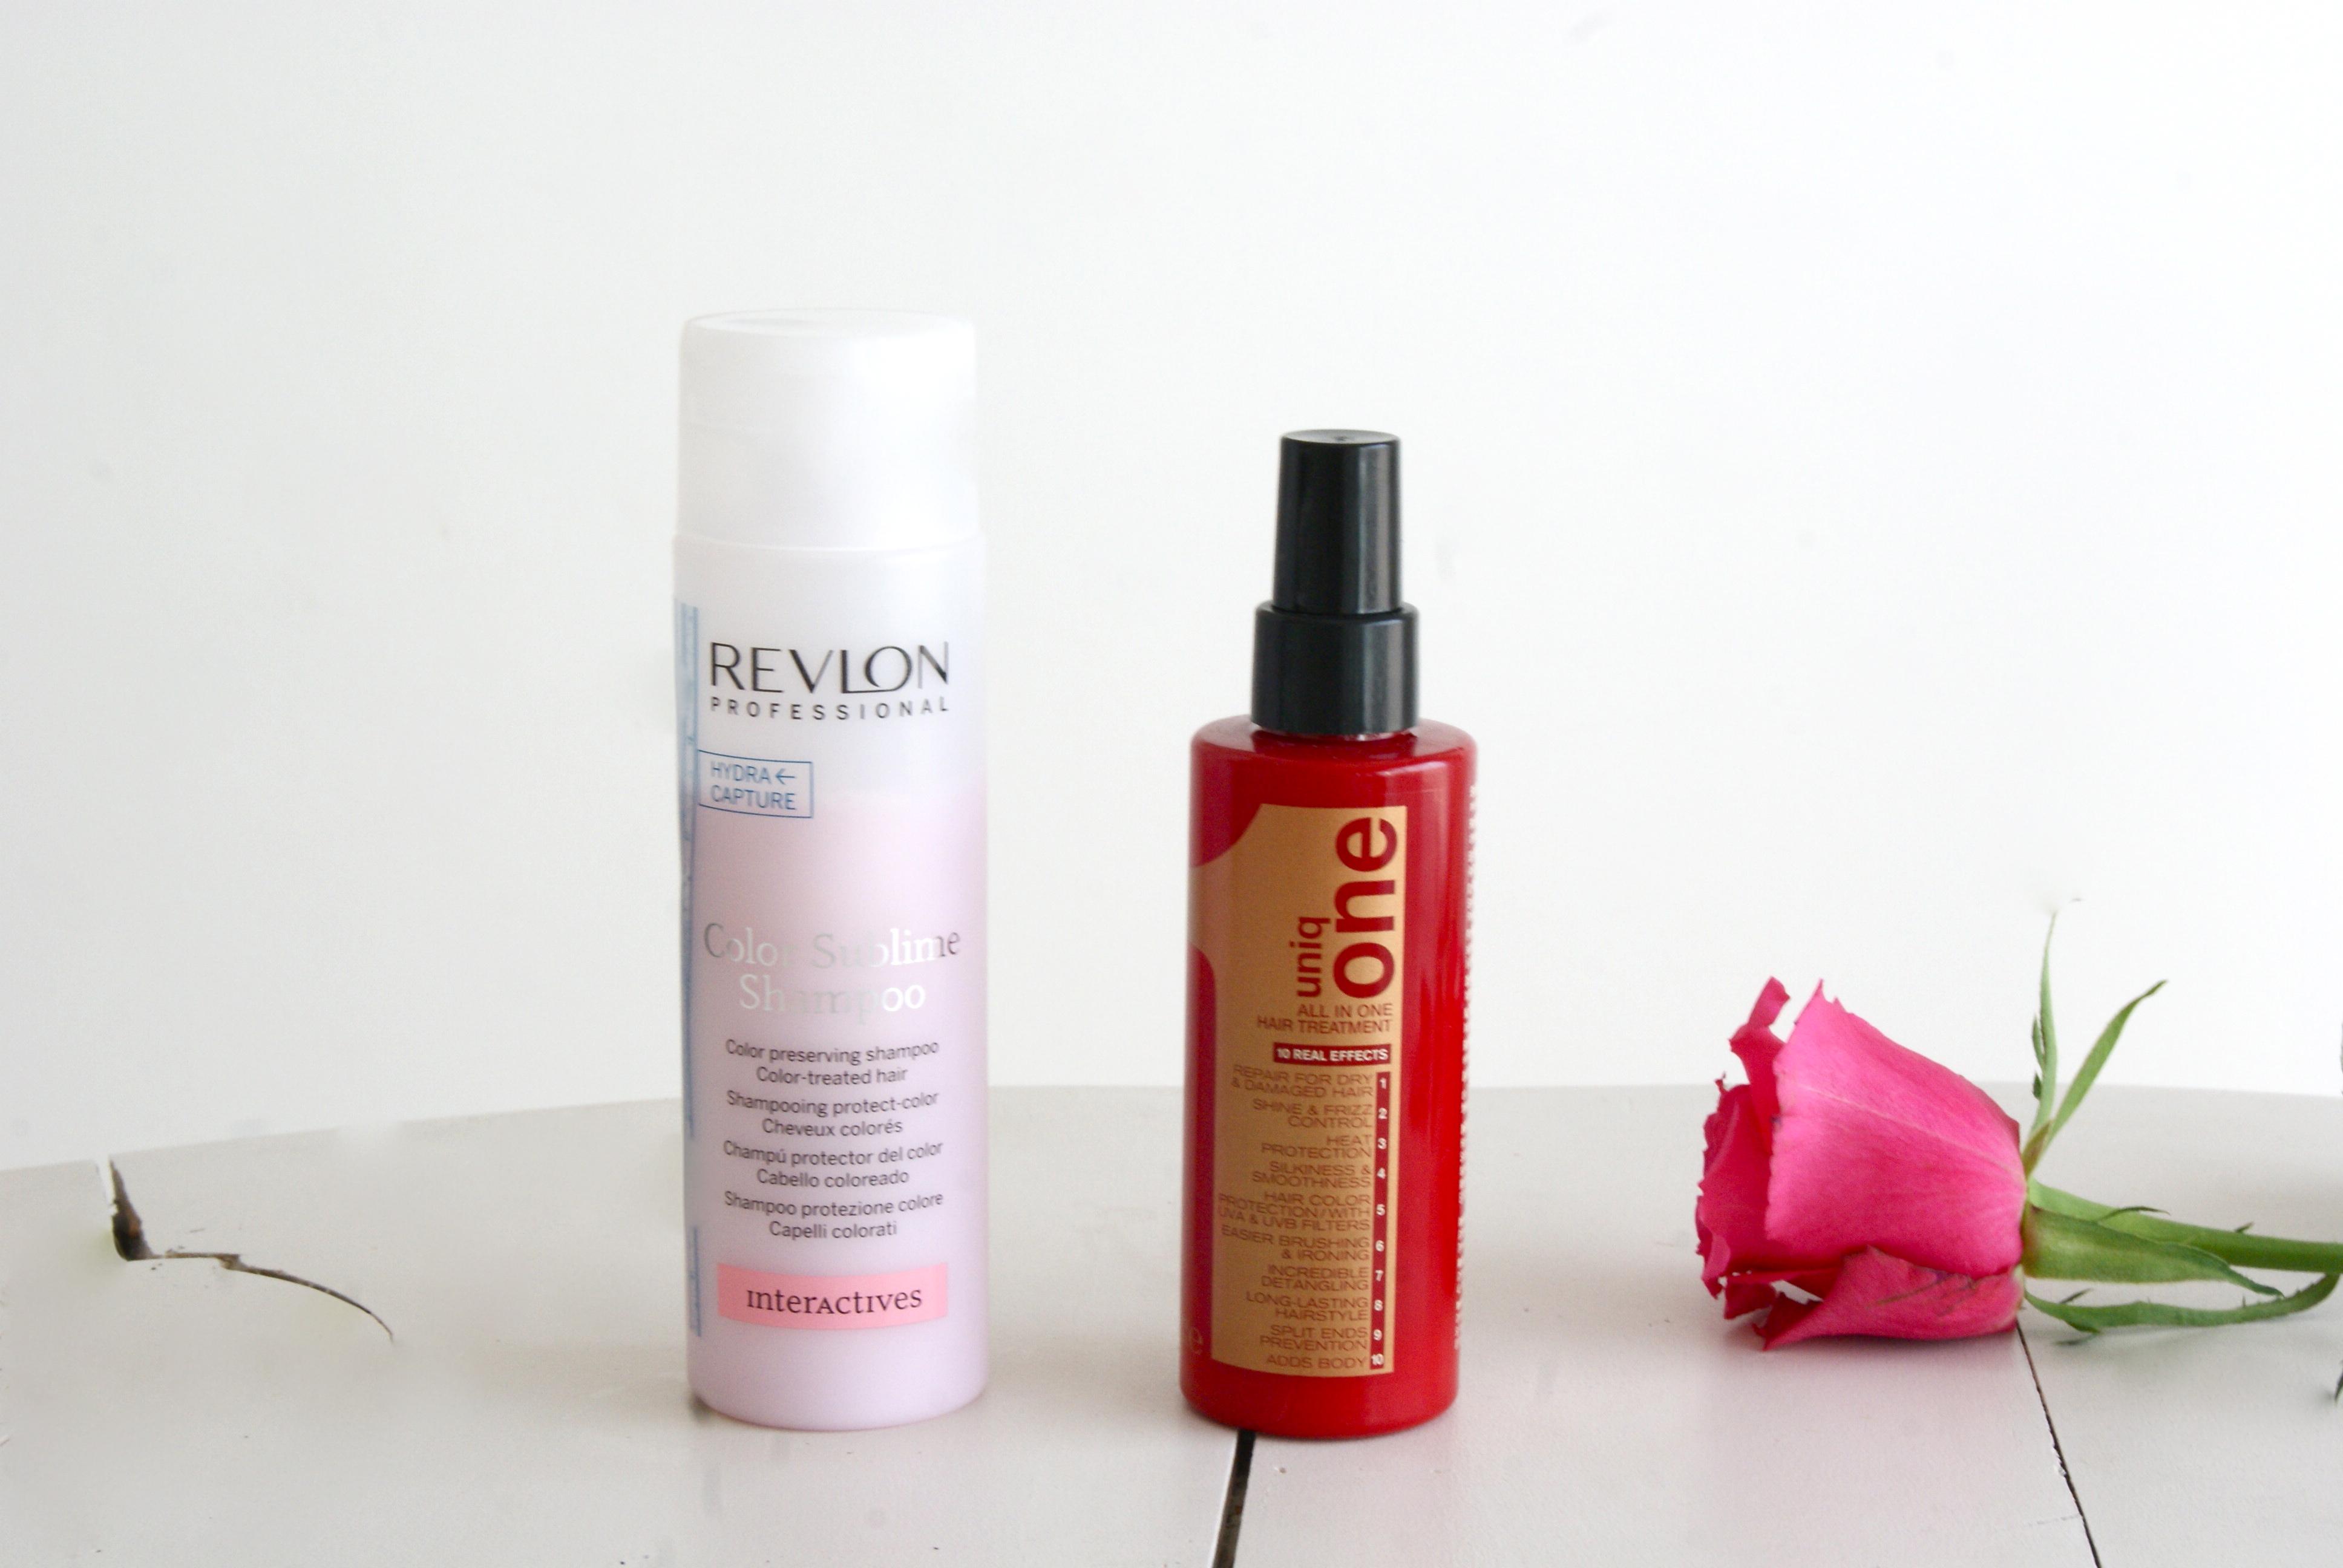 One après shampoing